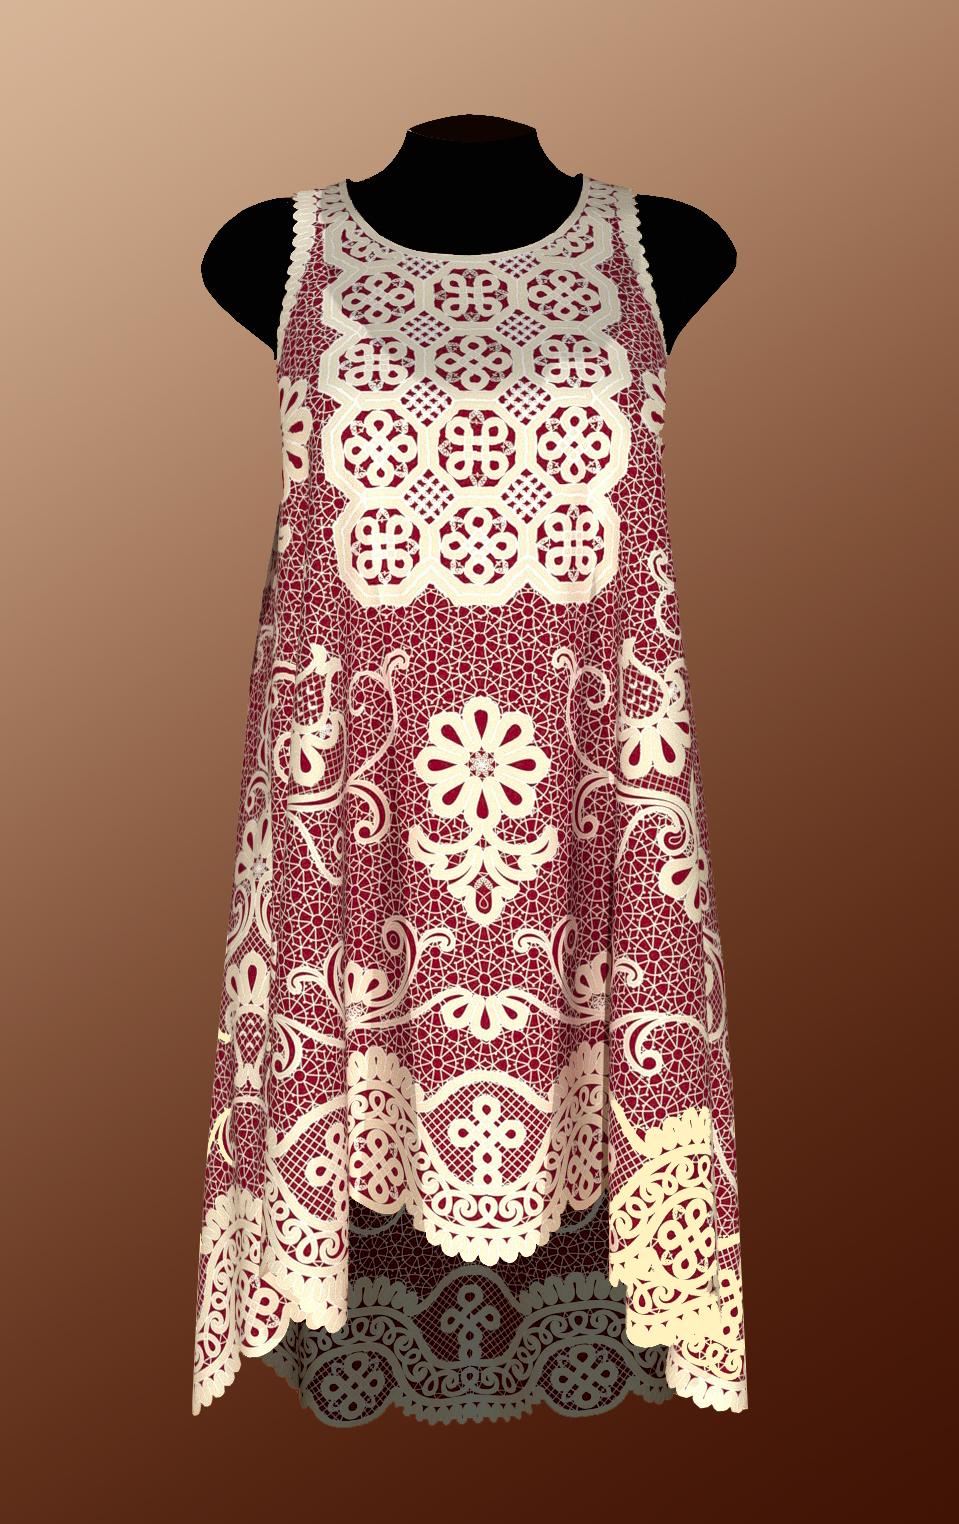 Сколок — Платье-туника. группа № 2 размеры: 52, 54, 56